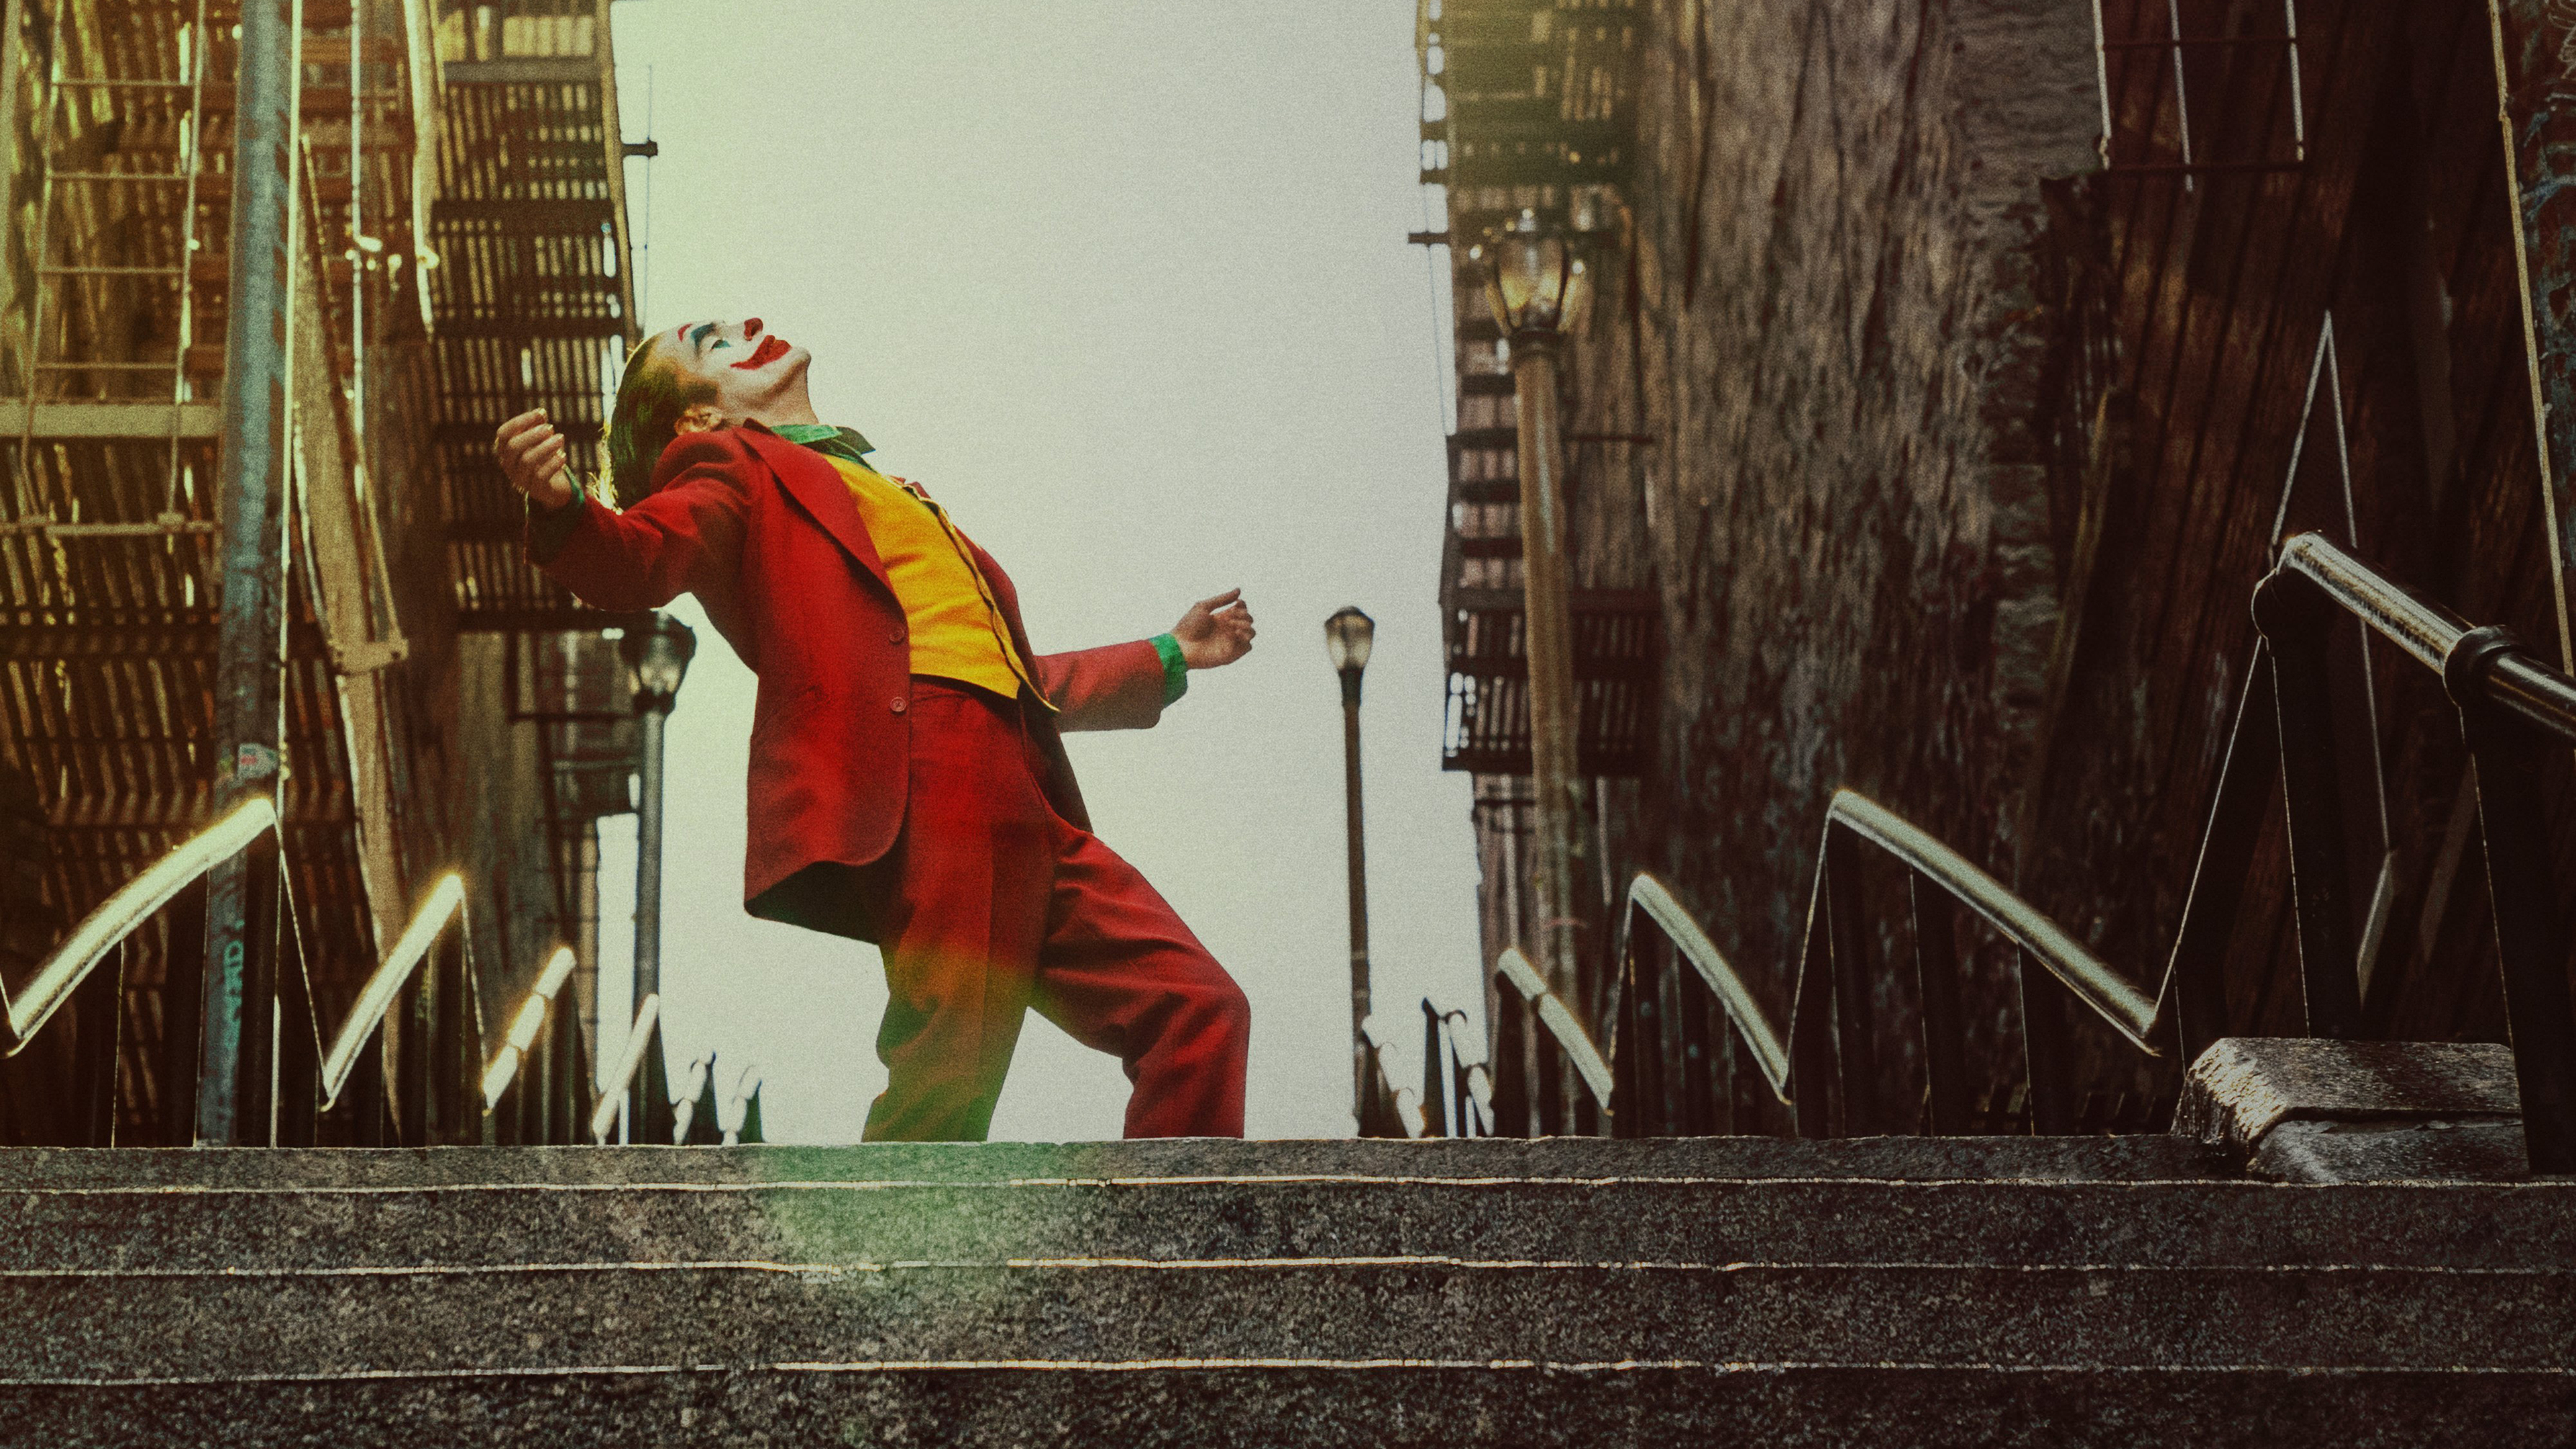 joker moie 2019 1569187512 - Joker Moie 2019 - poster wallpapers, movies wallpapers, joker wallpapers, joker movie wallpapers, joaquin phoenix wallpapers, hd-wallpapers, 8k wallpapers, 5k wallpapers, 4k-wallpapers, 2019 movies wallpapers